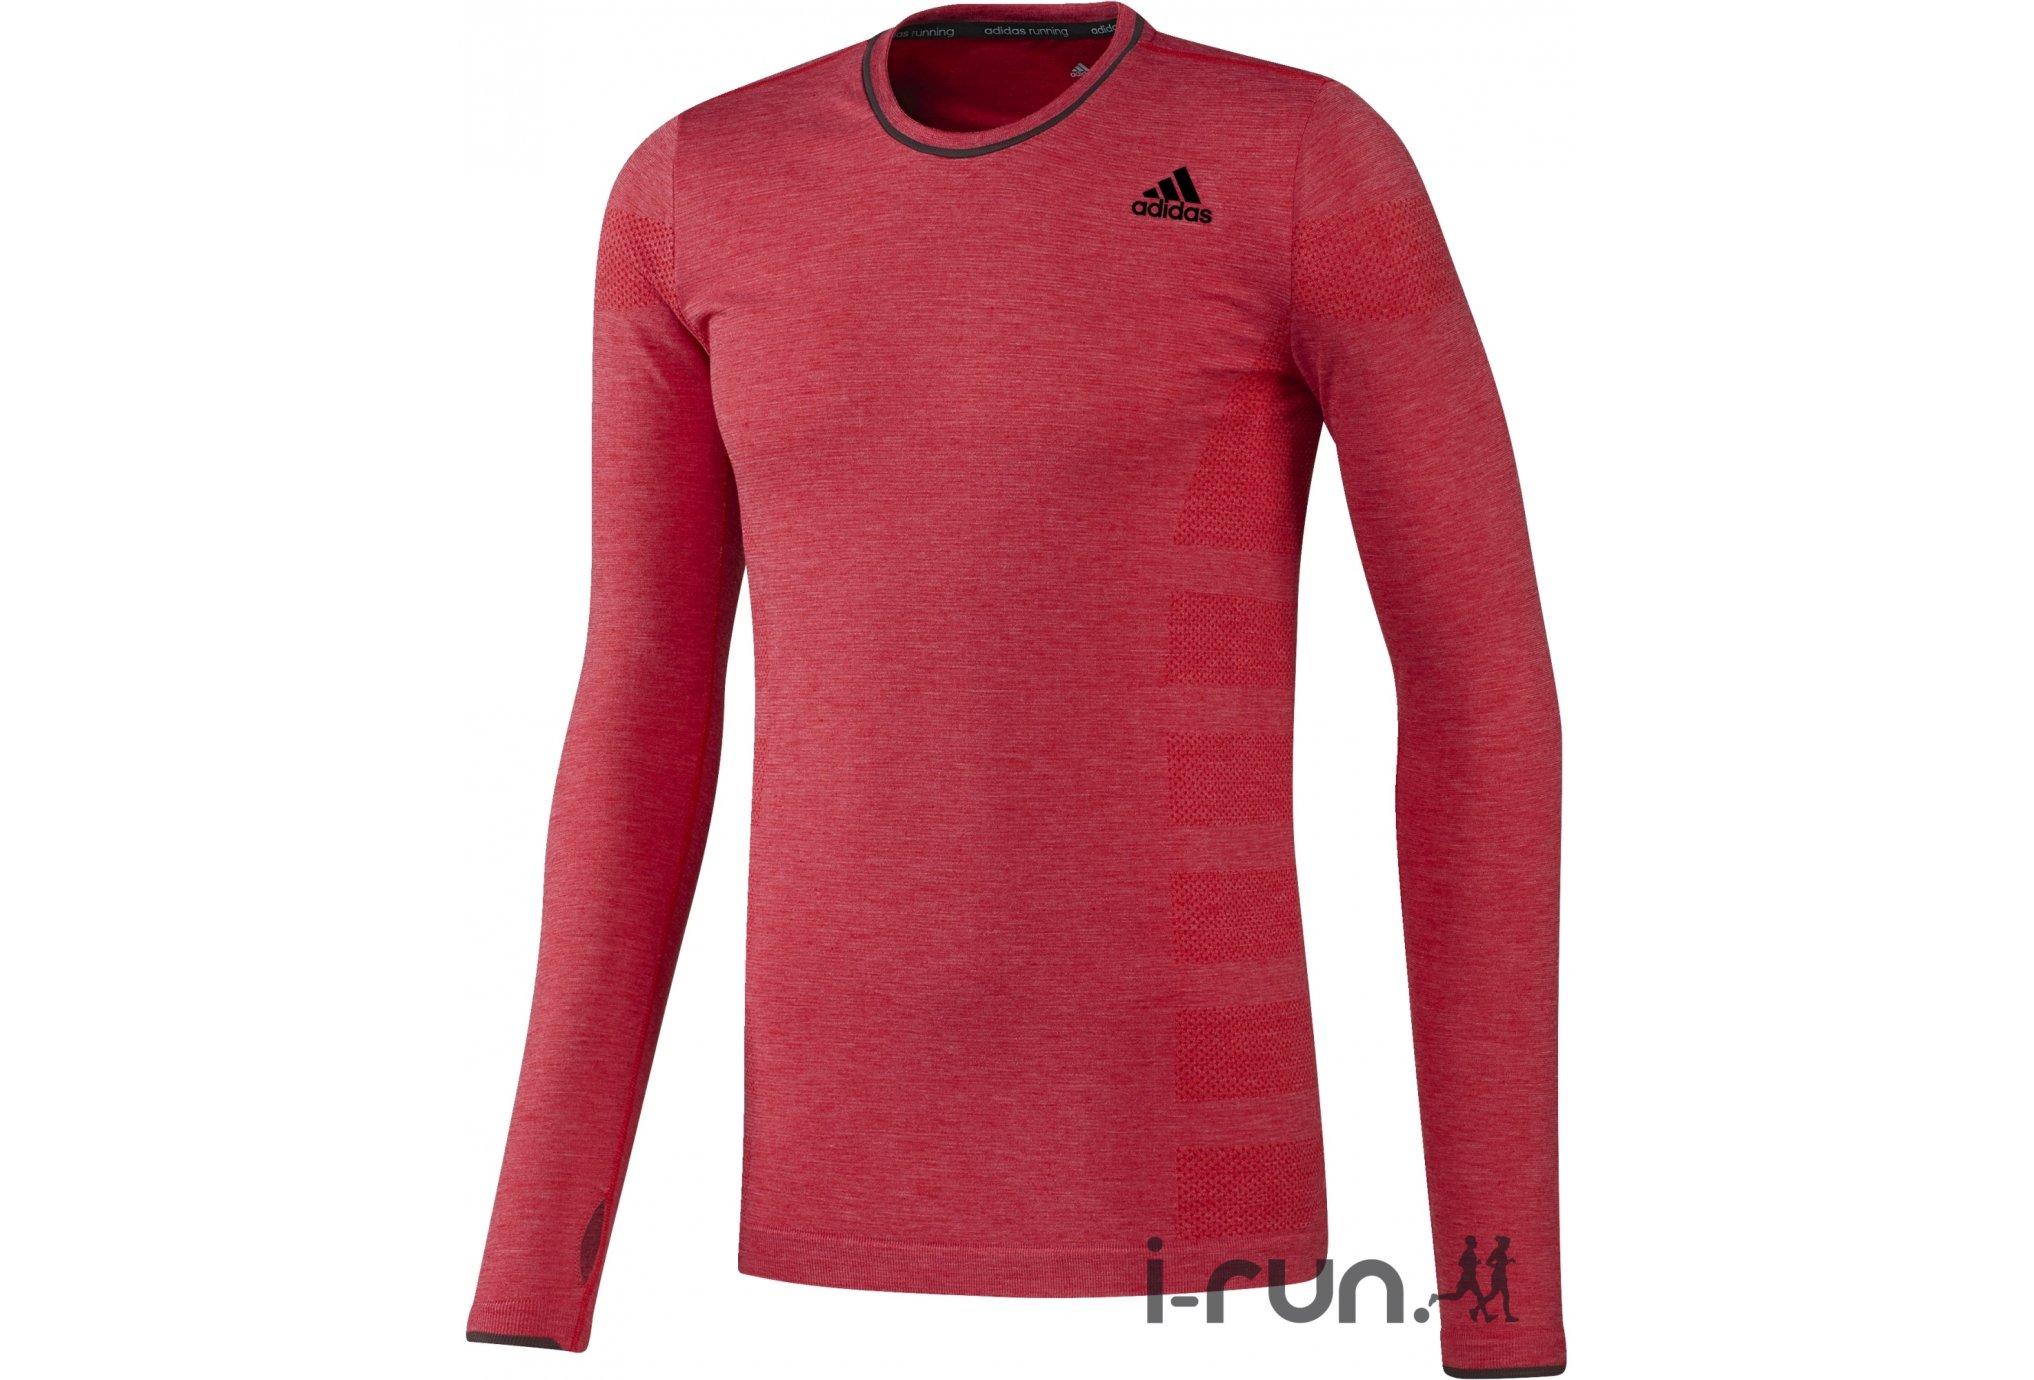 Adidas Adistar primeknit m vêtement running homme